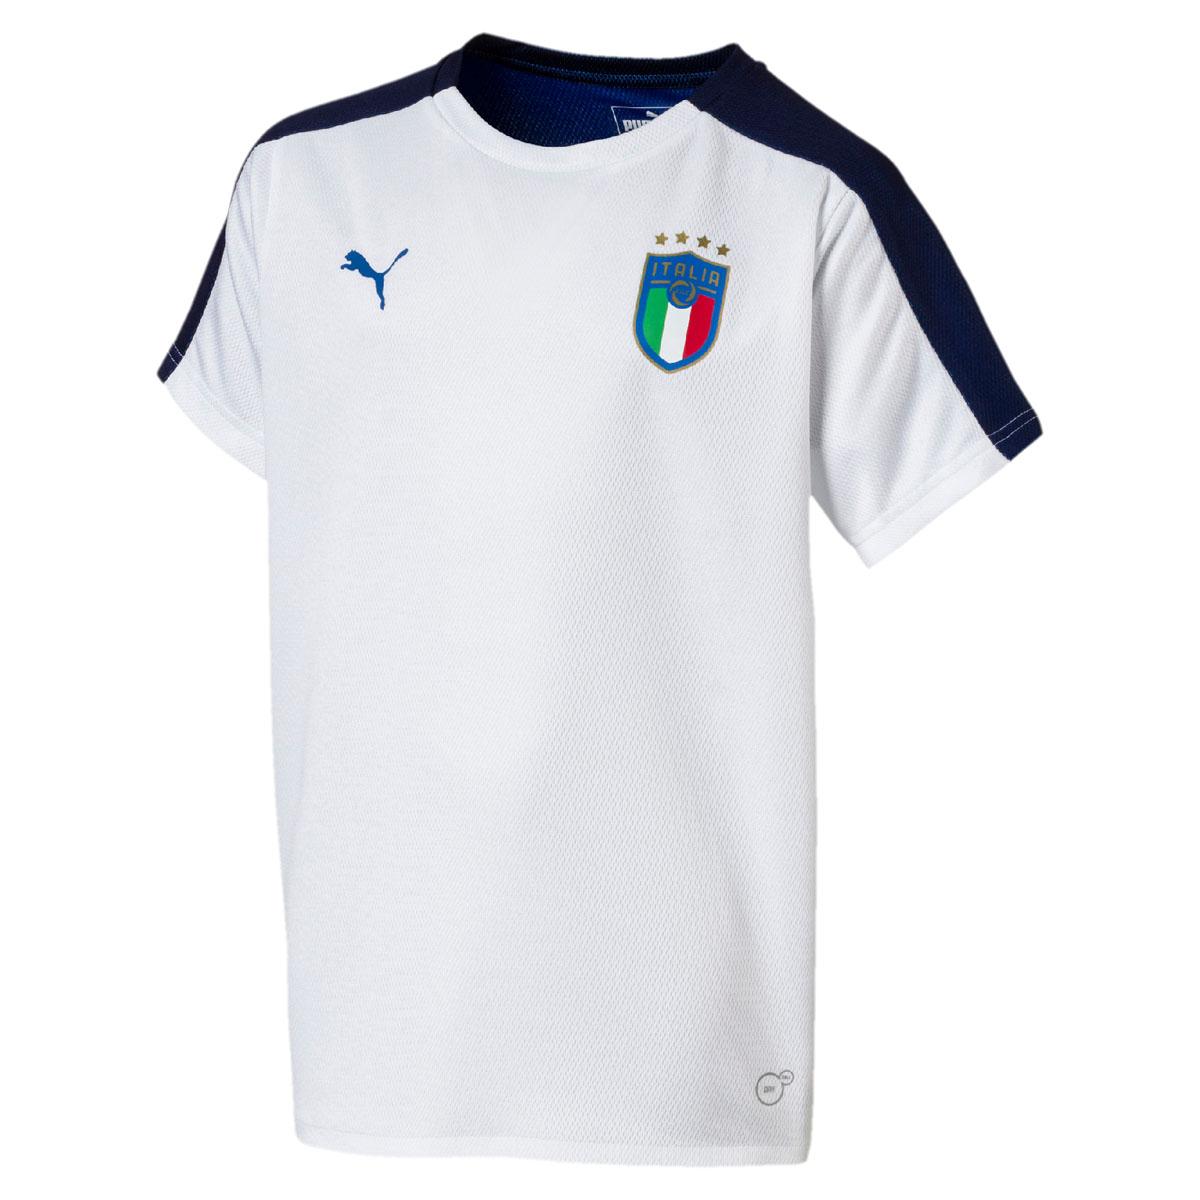 Футболка для мальчика Puma FIGC Italia Jersey SS Jr, цвет: белый. 753102027. Размер 152753102027